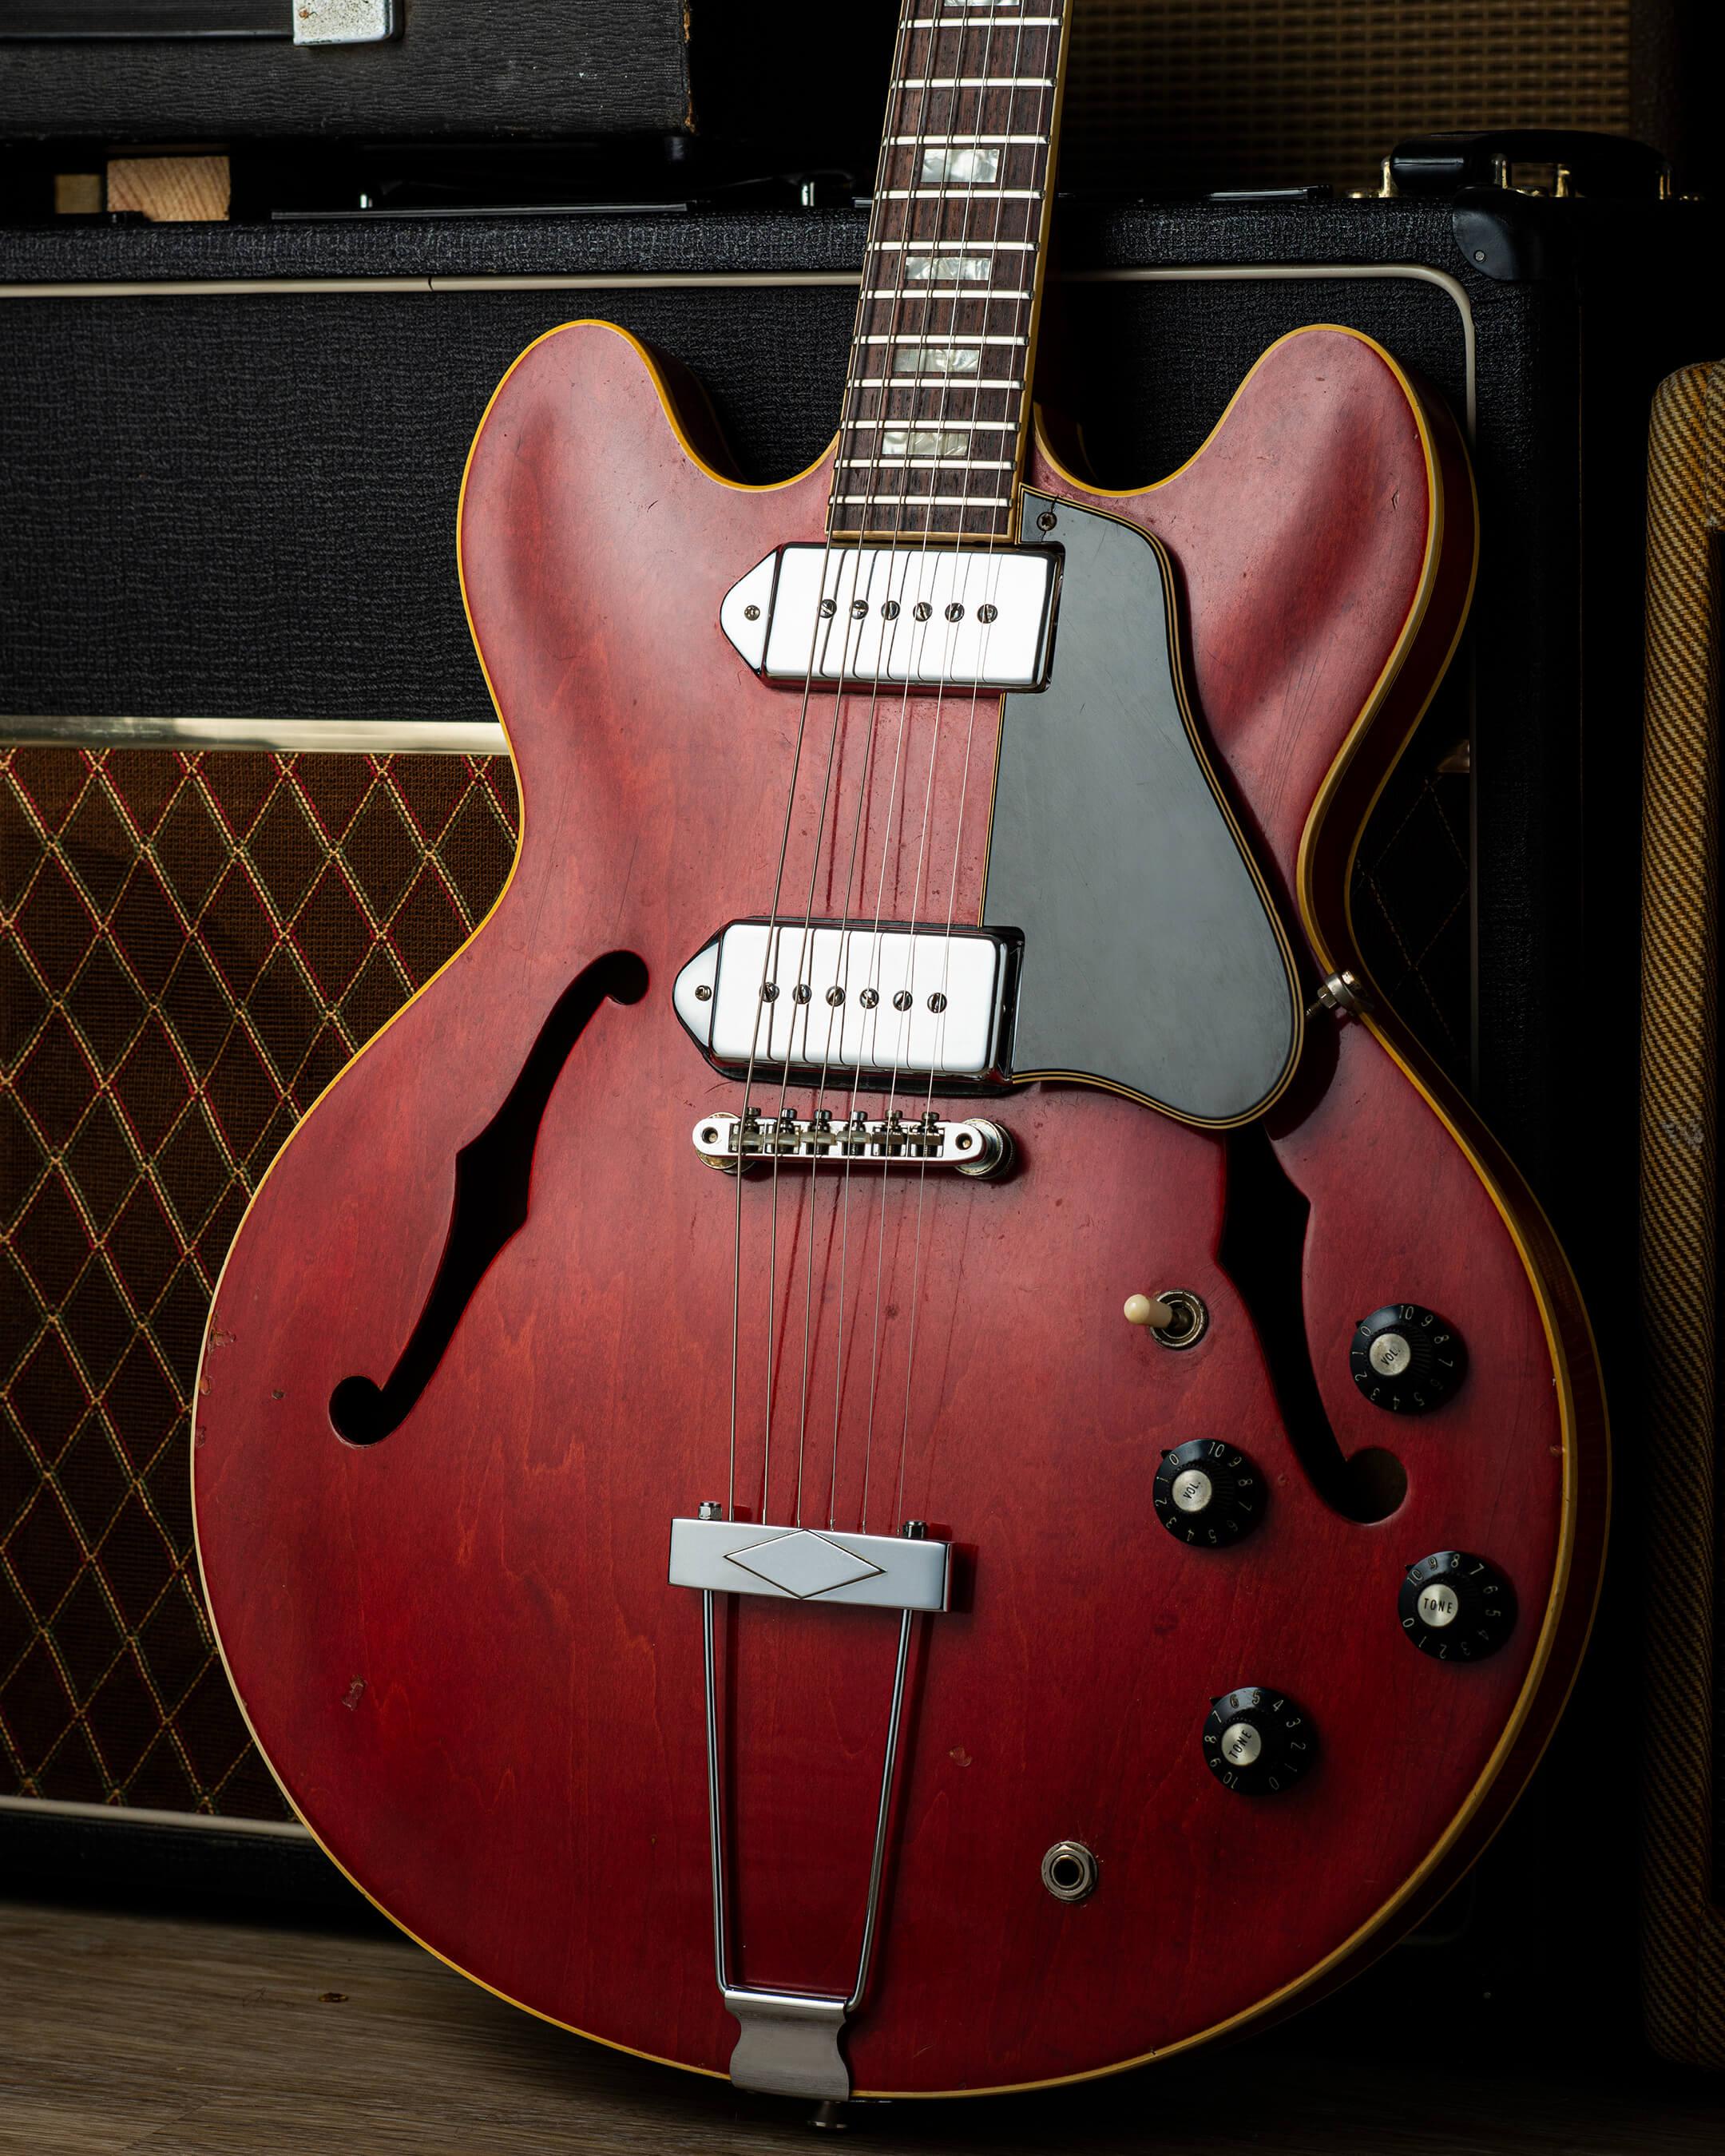 Vintage Bench Test: Gibson 1969 Es-330 'Long Neck'